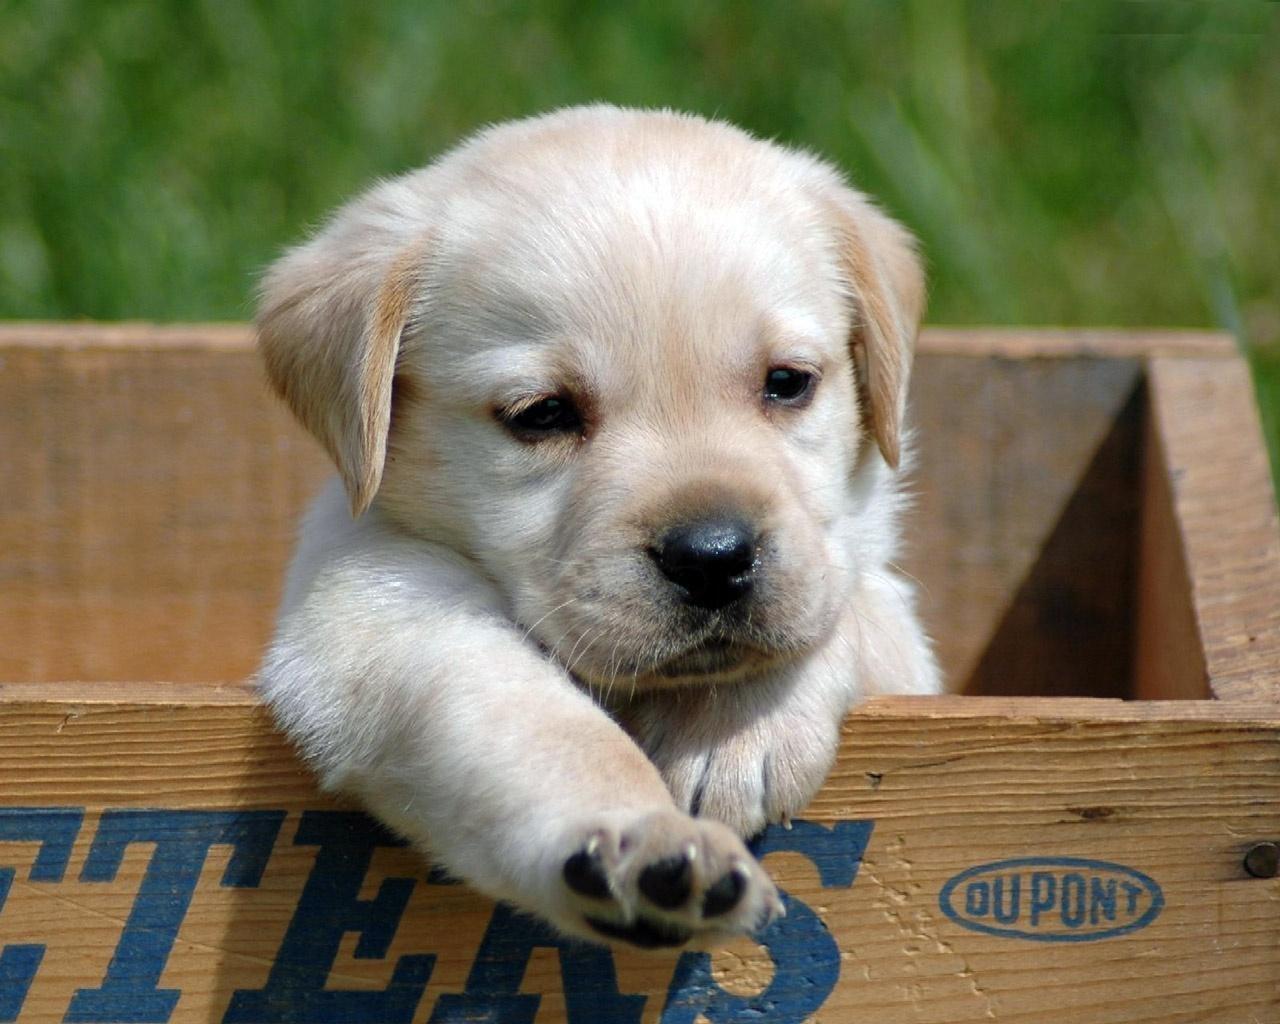 Puppies  Puppies Photo 29017071  Fanpop